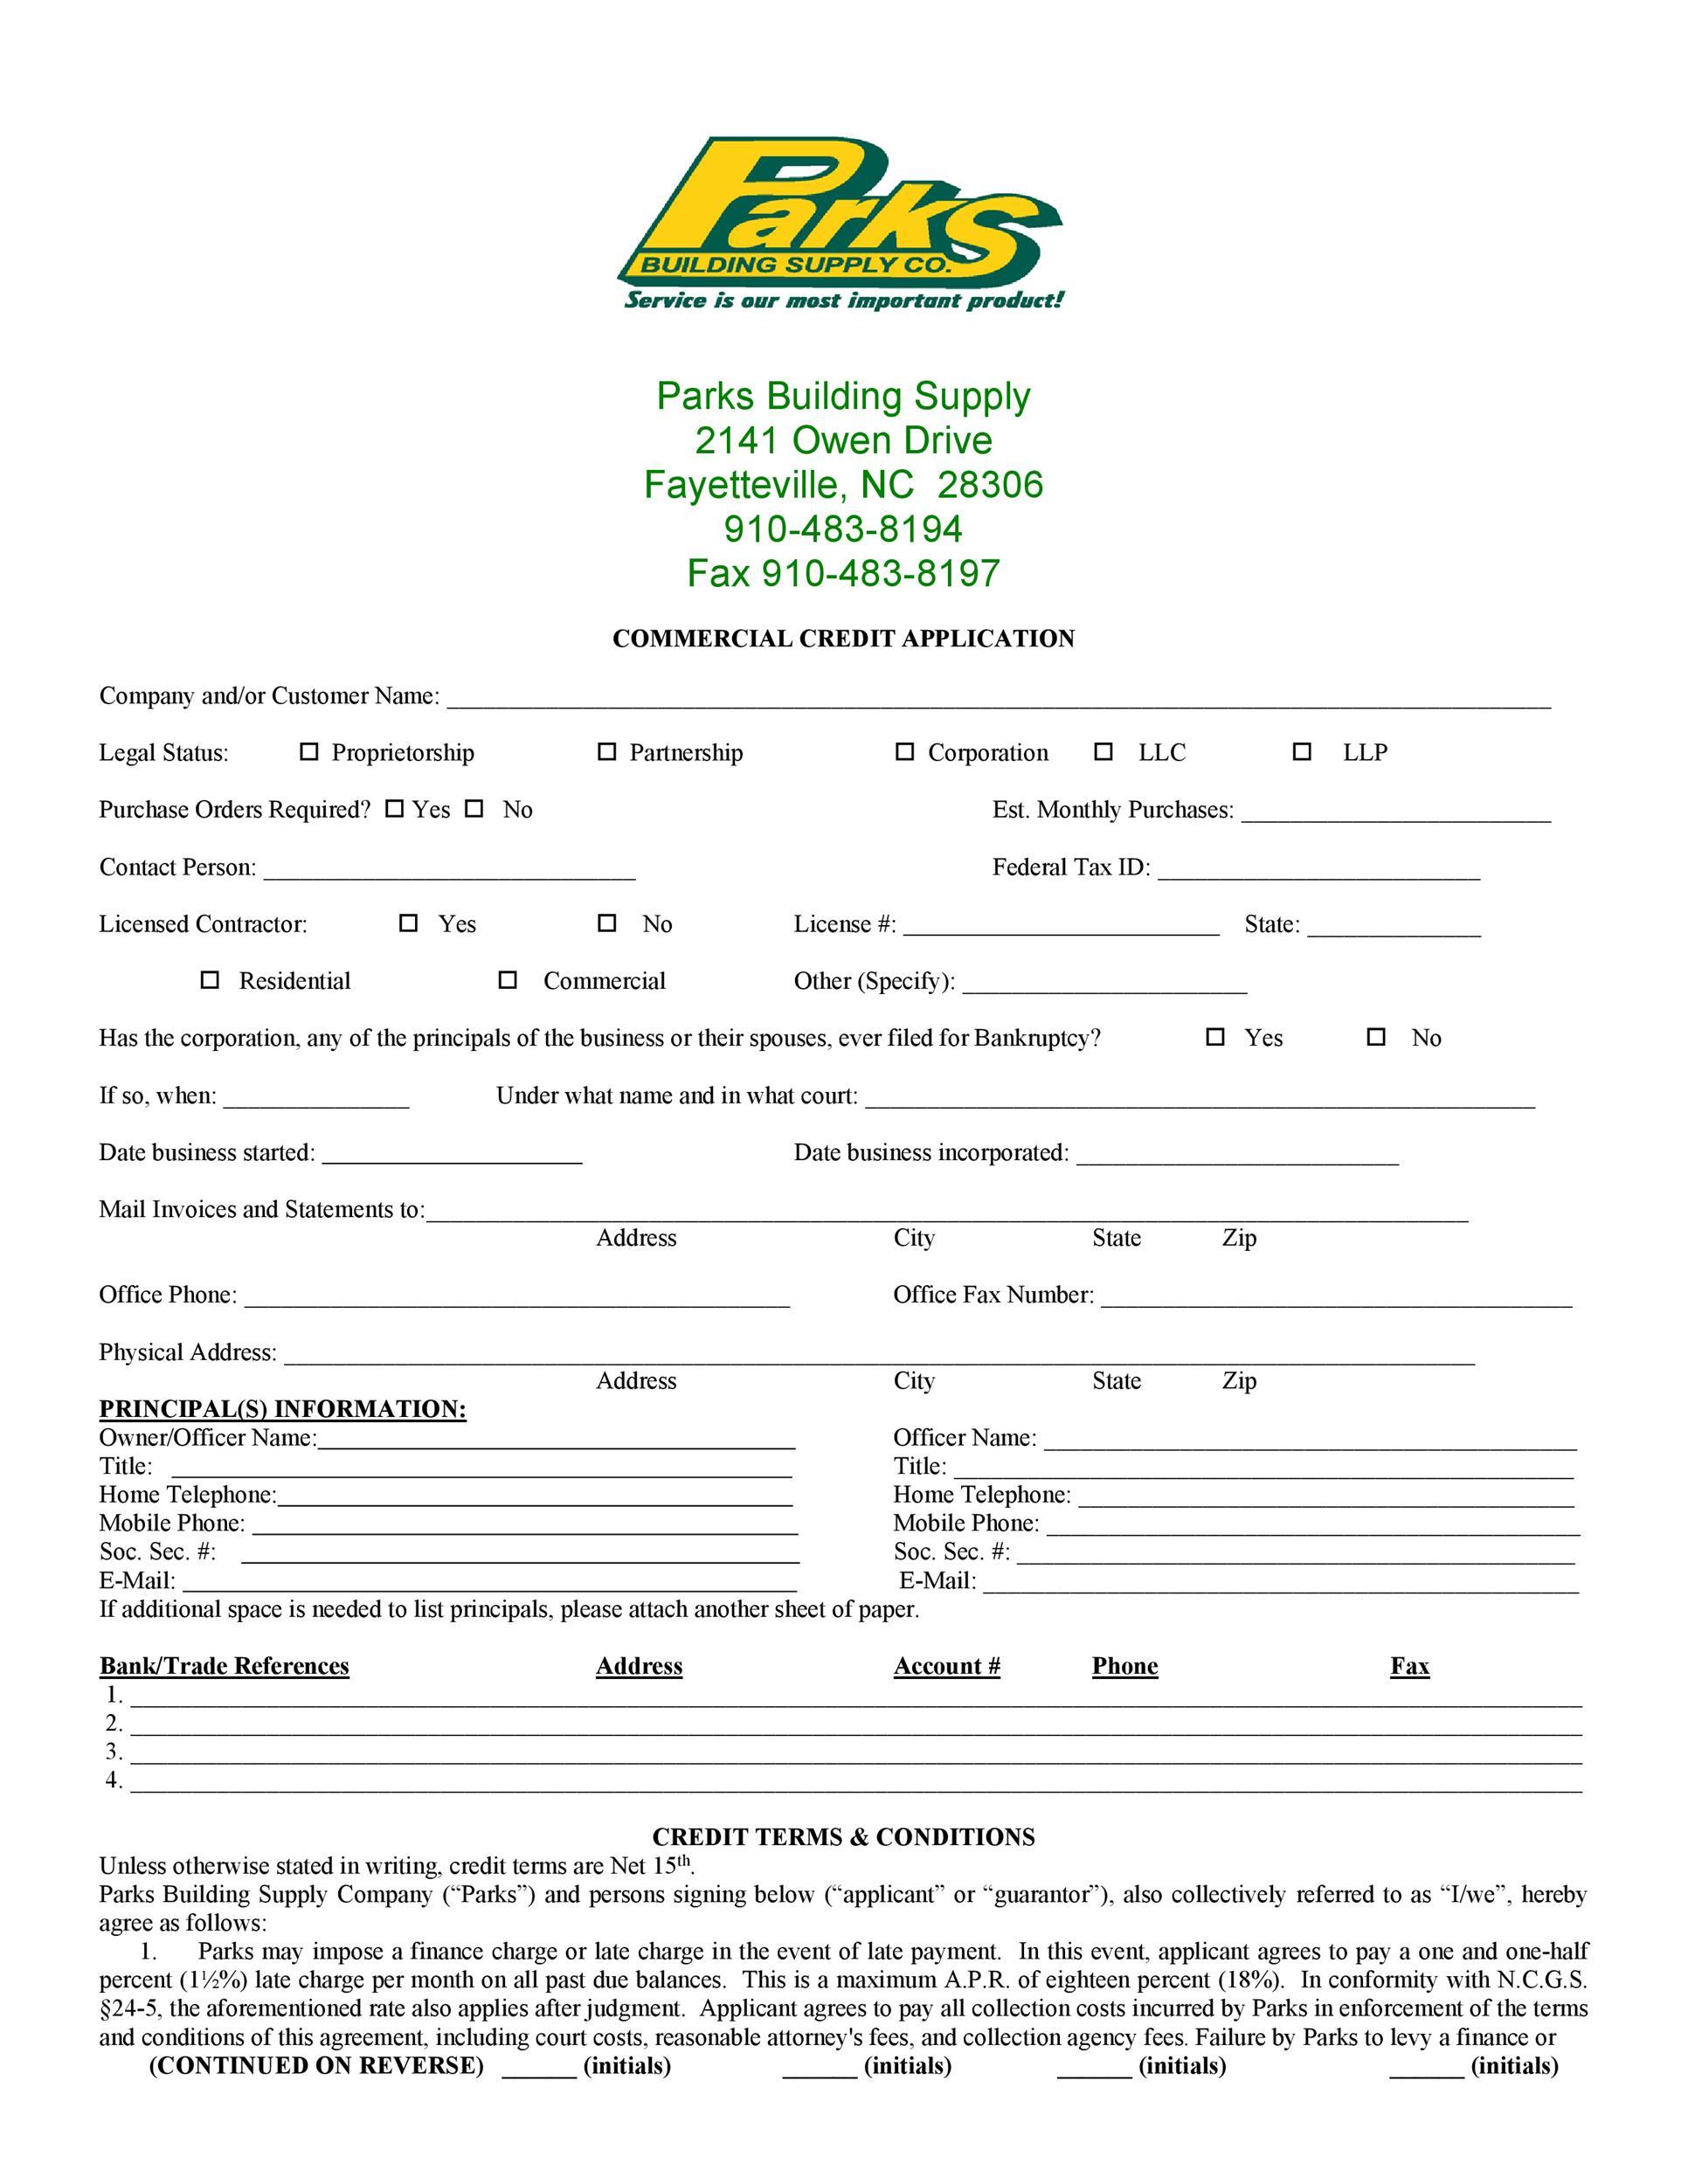 Free Credit Application Form 32